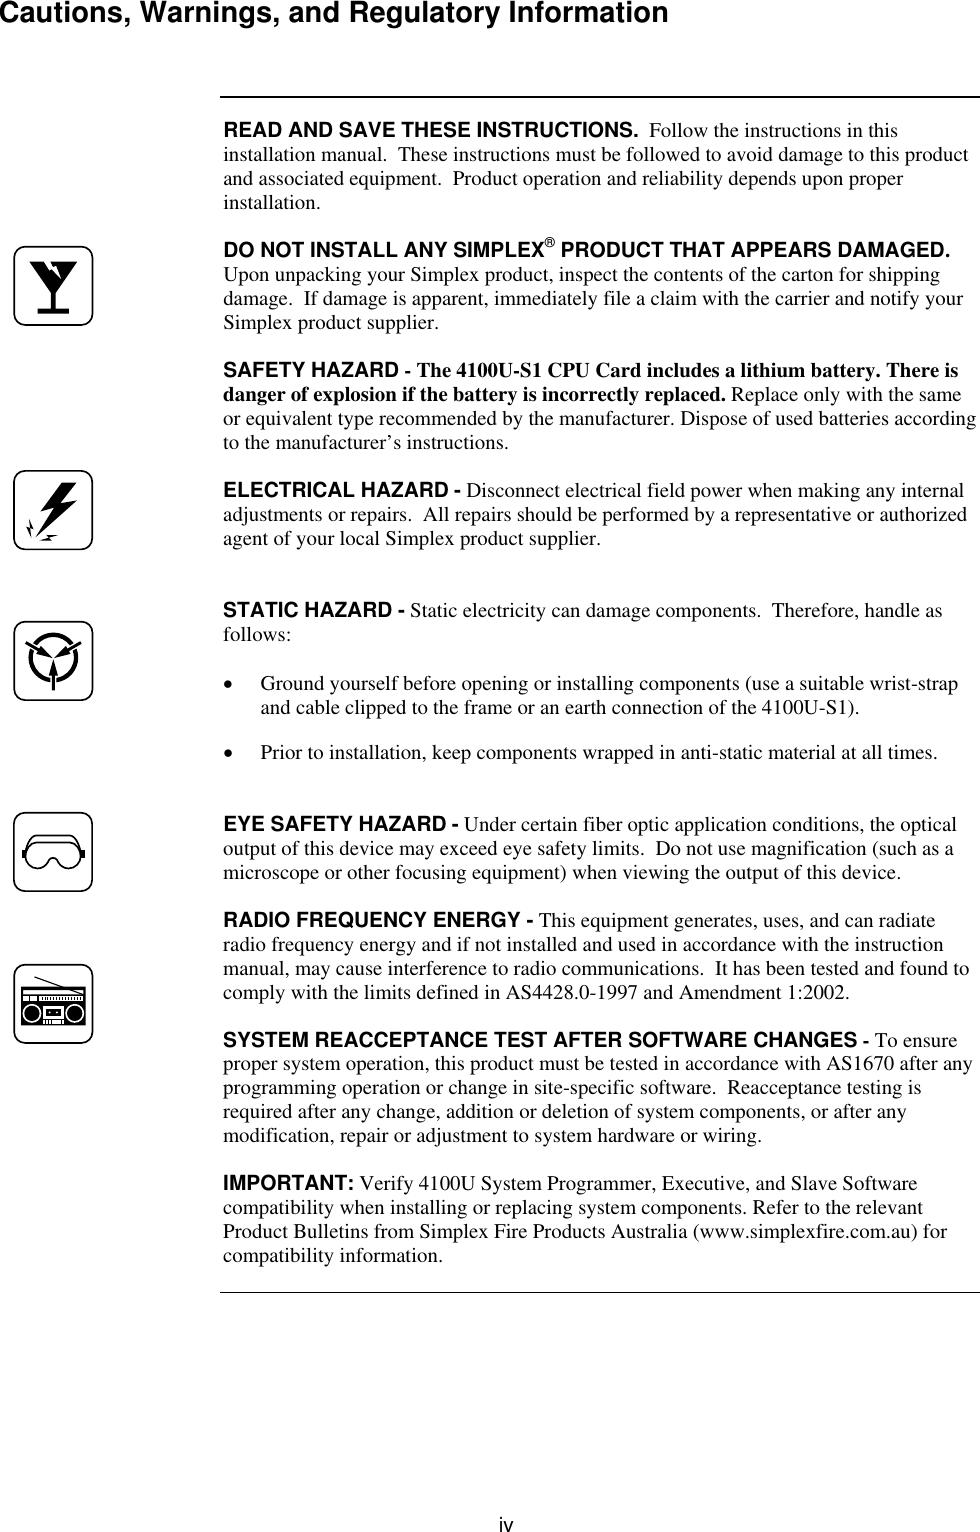 Tyco 4100U S1 Users Manual LT0394 SP1 Installation & Maintenance